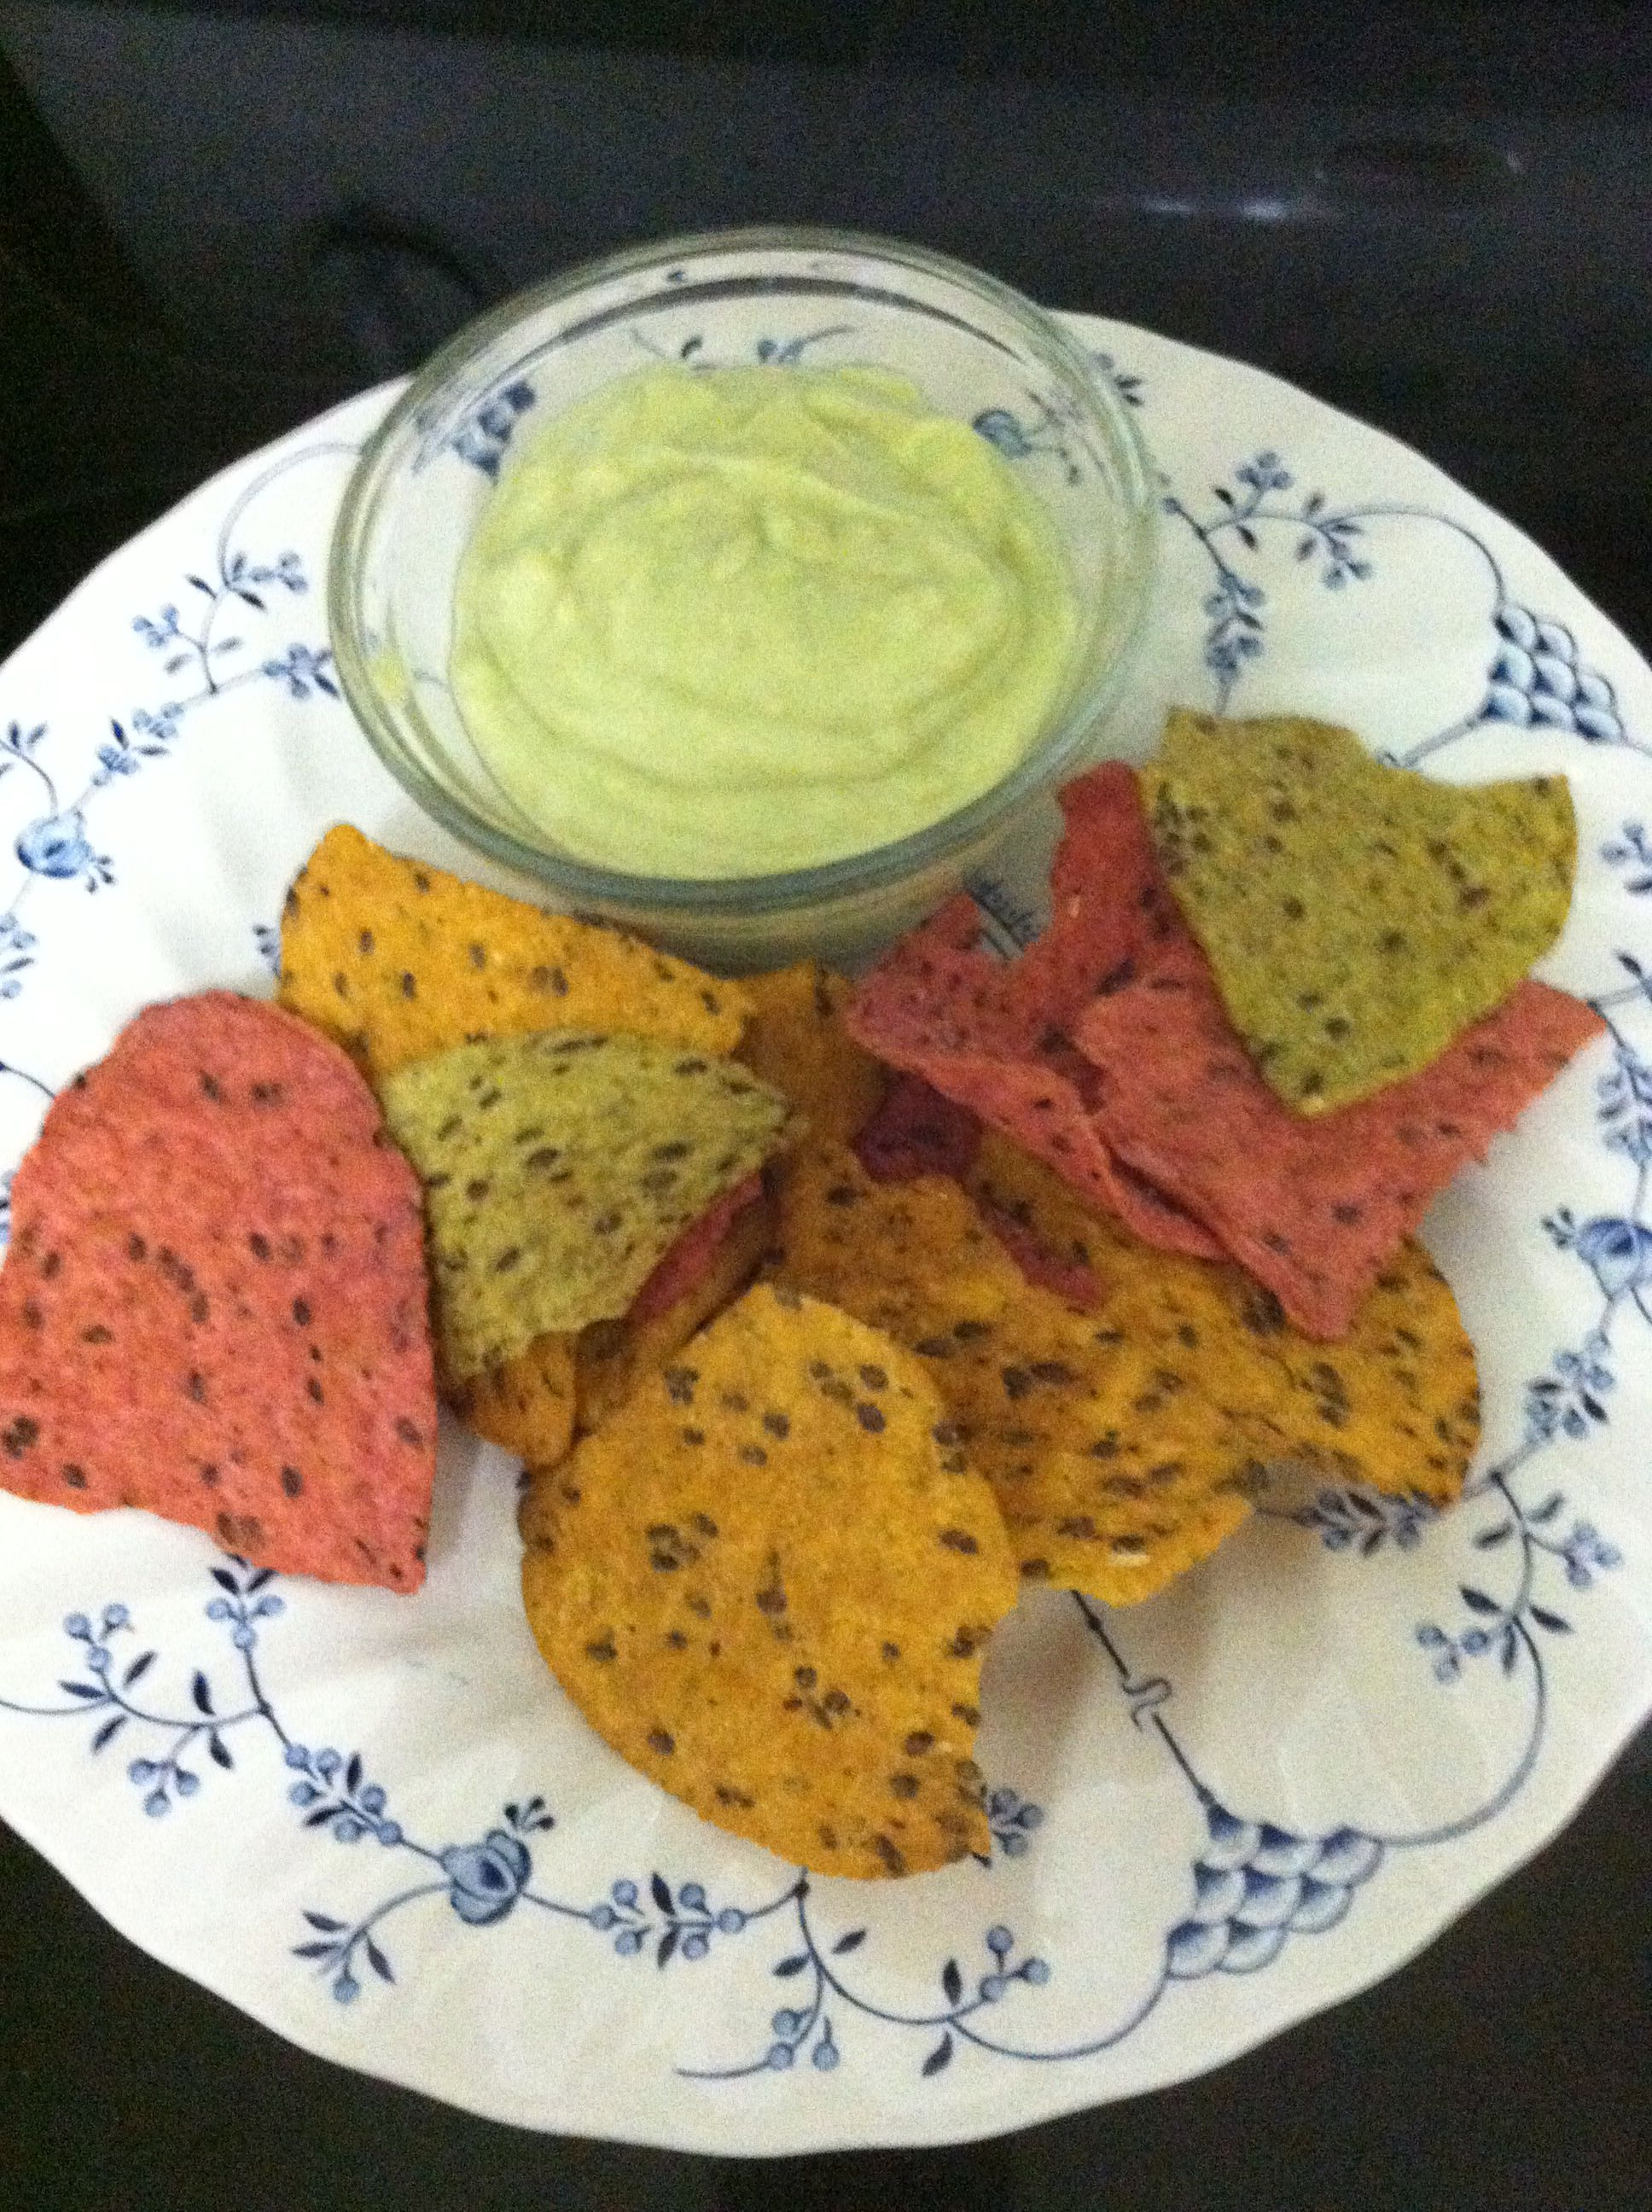 Creamy Avocado Yogurt Dip Recipes — Dishmaps